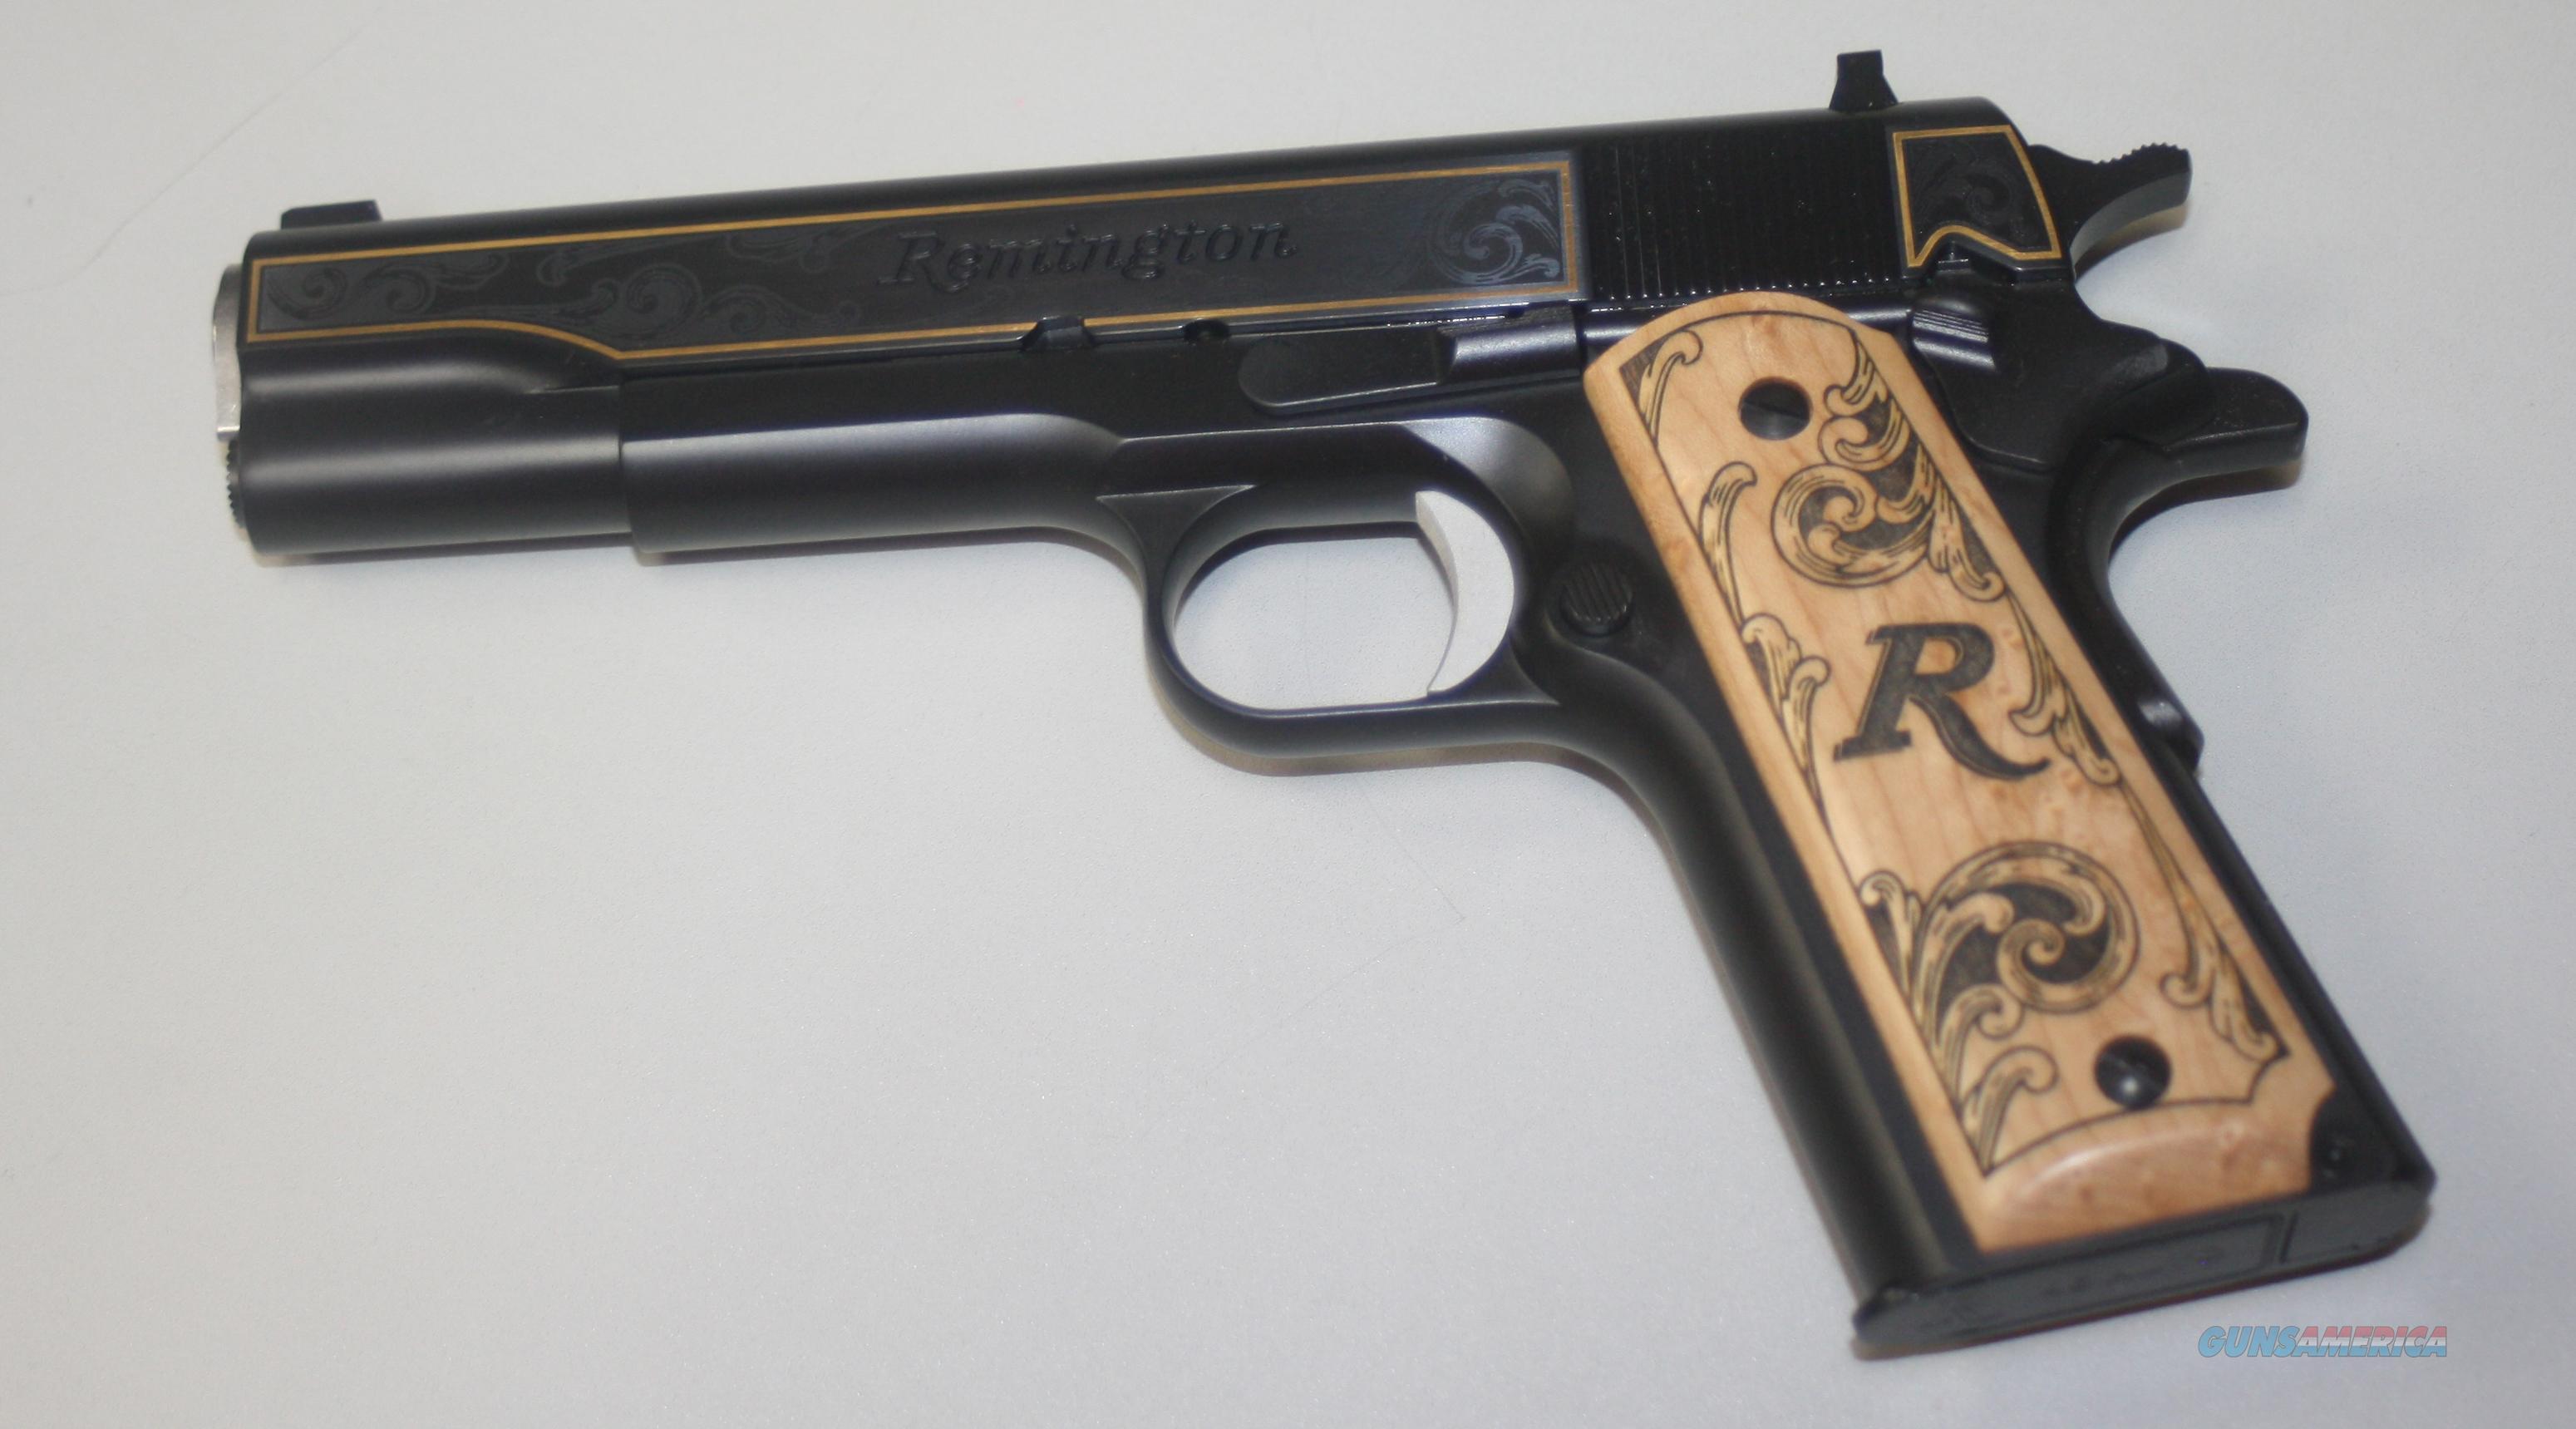 REMINGTON RI HIGH GRADE 1911 45ACP  Guns > Pistols > Remington Pistols - Modern > 1911